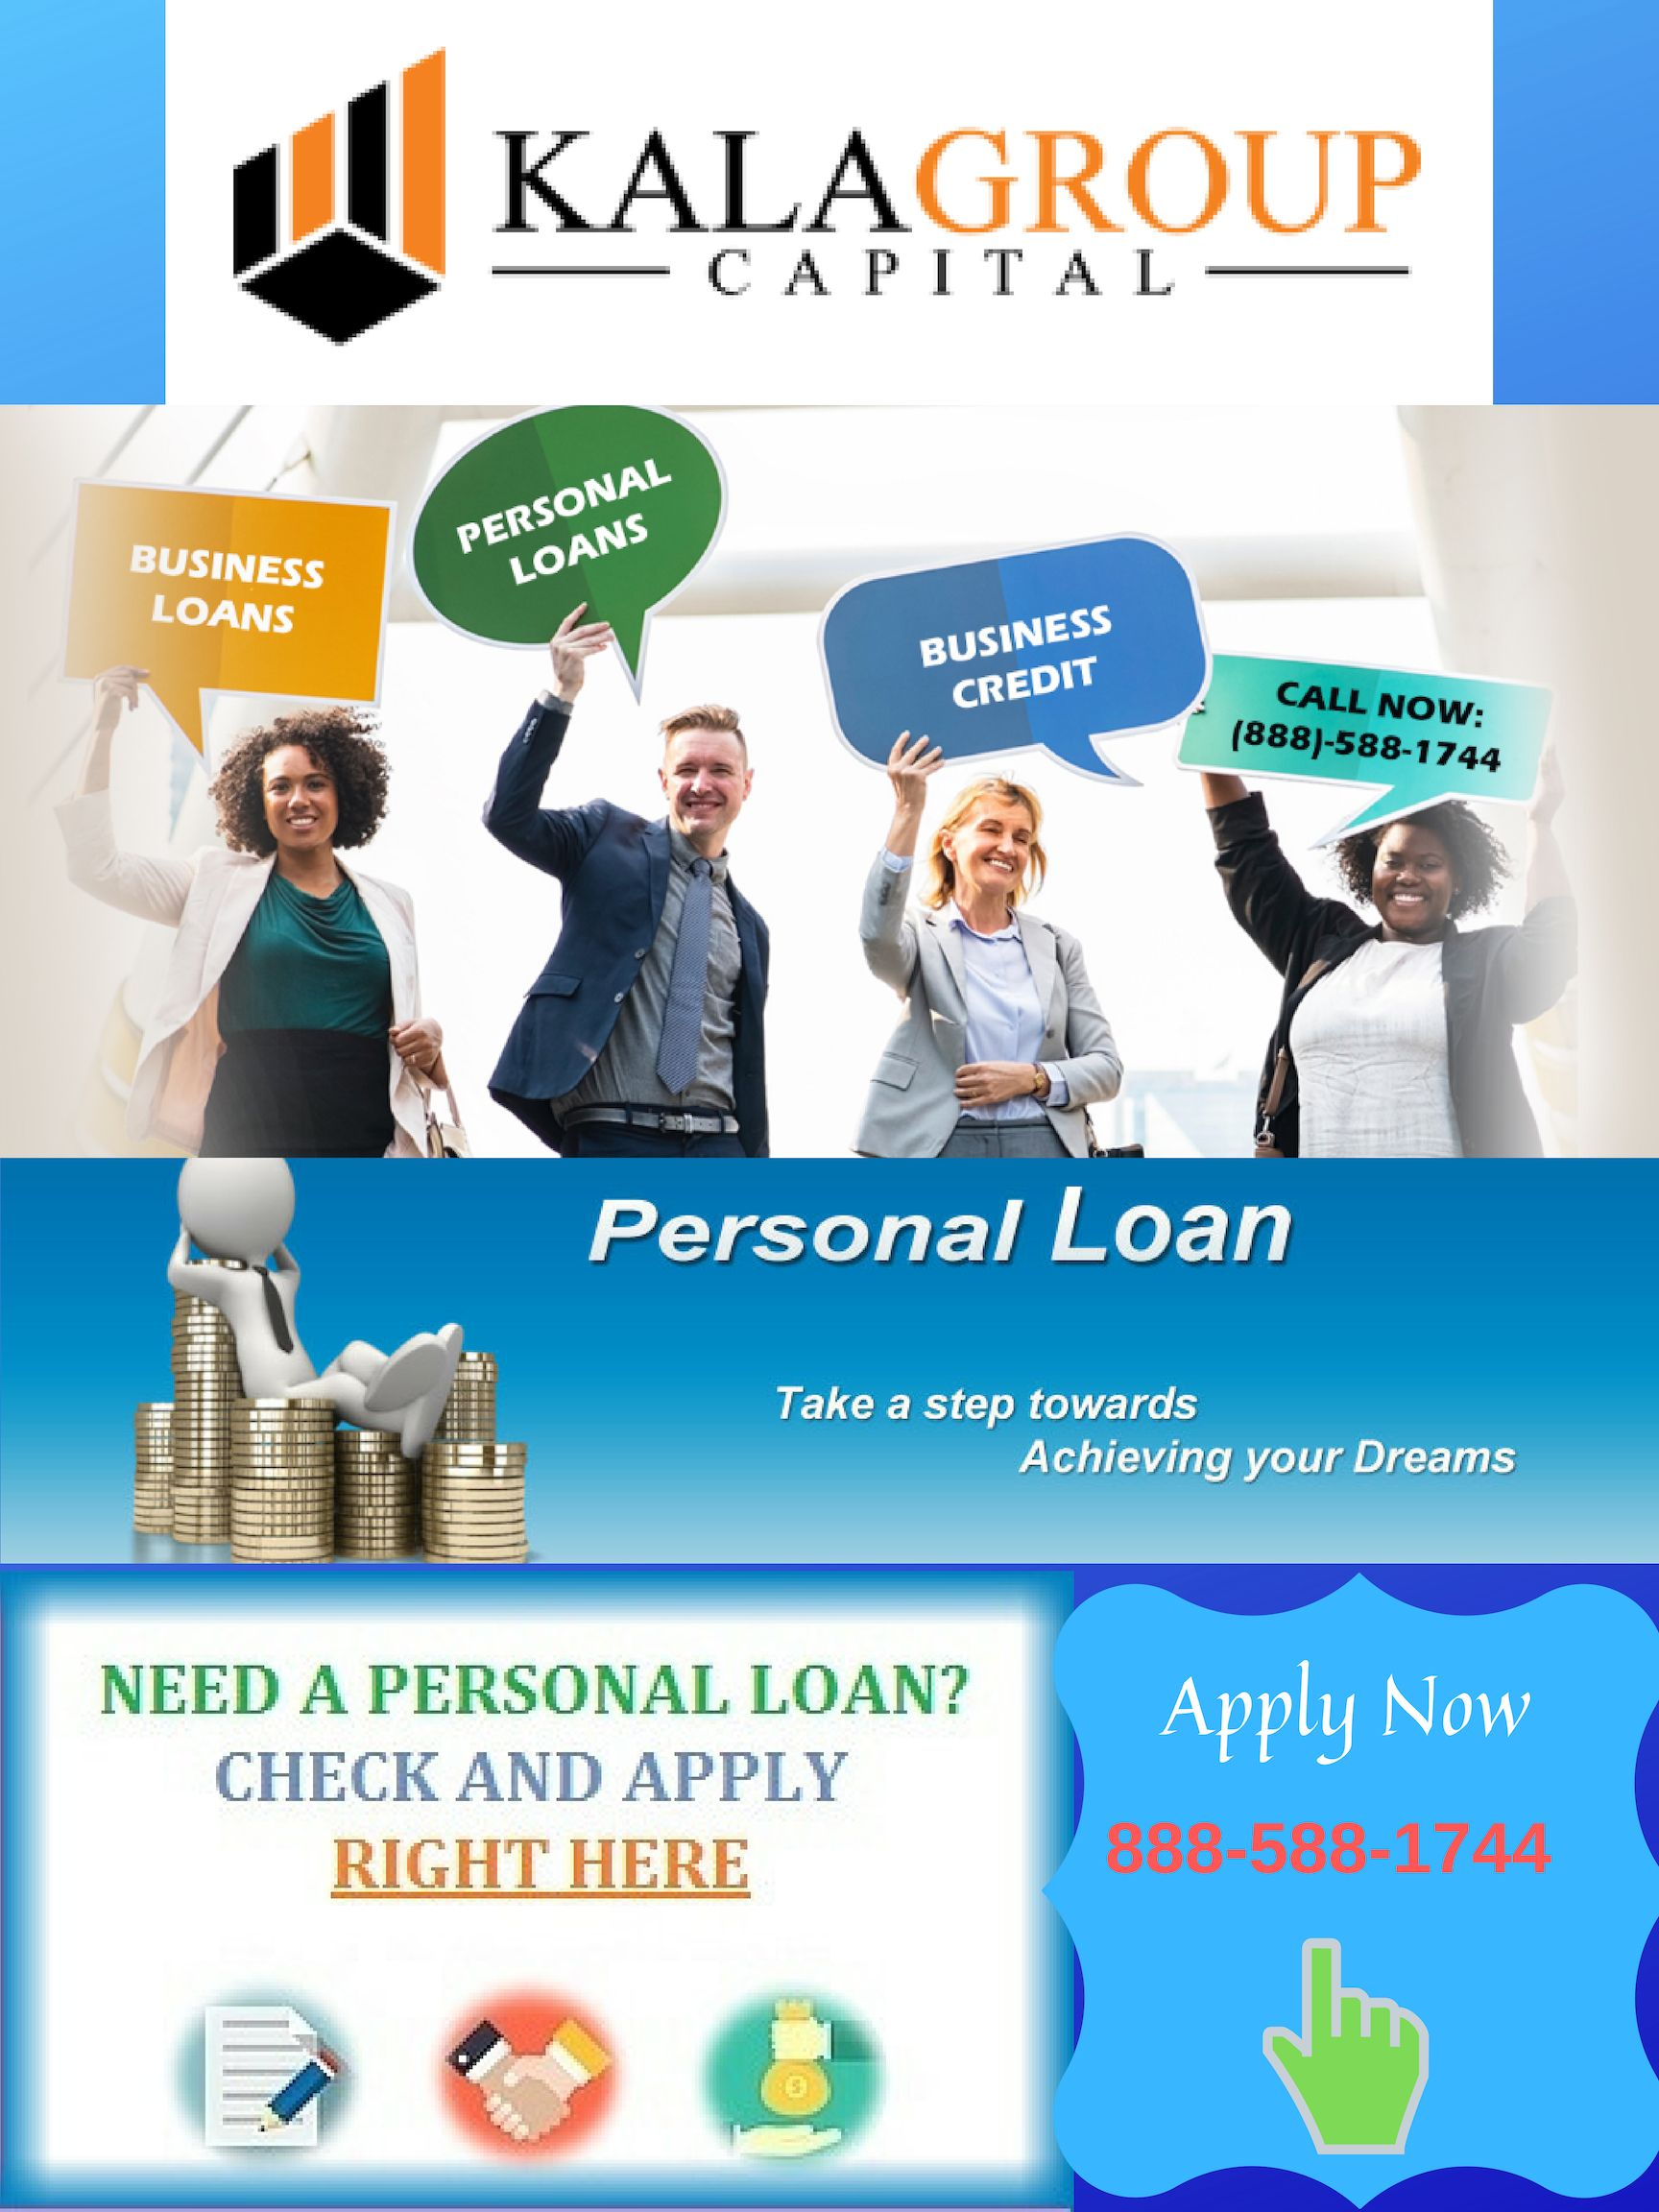 Pin On Personal Loans Kala Group